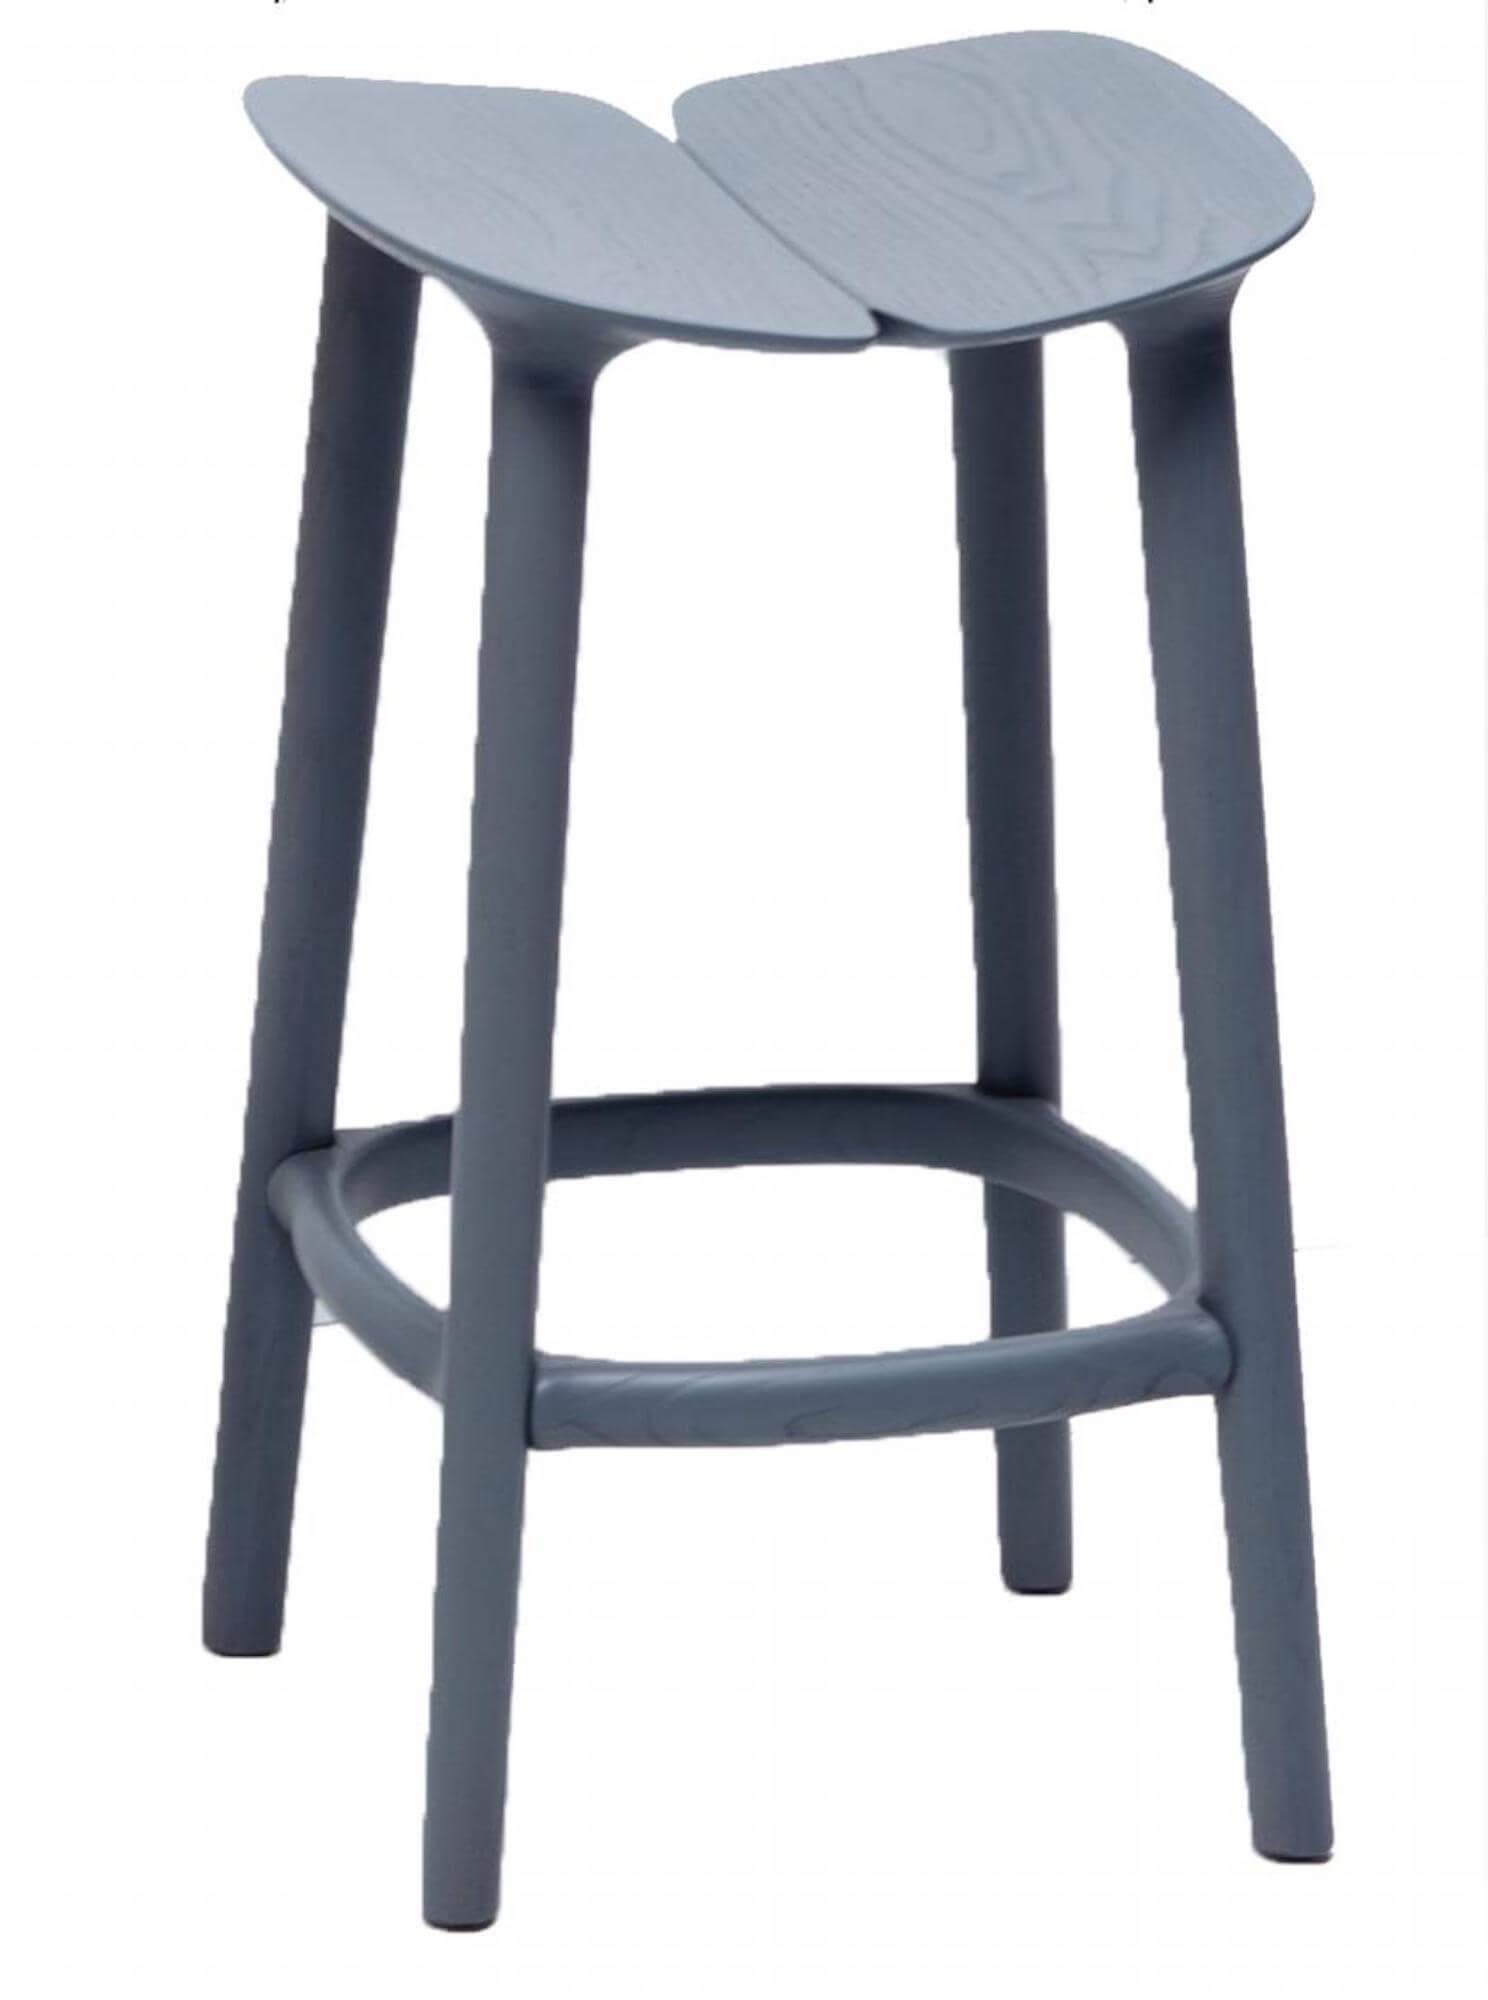 est living osso stool district 1